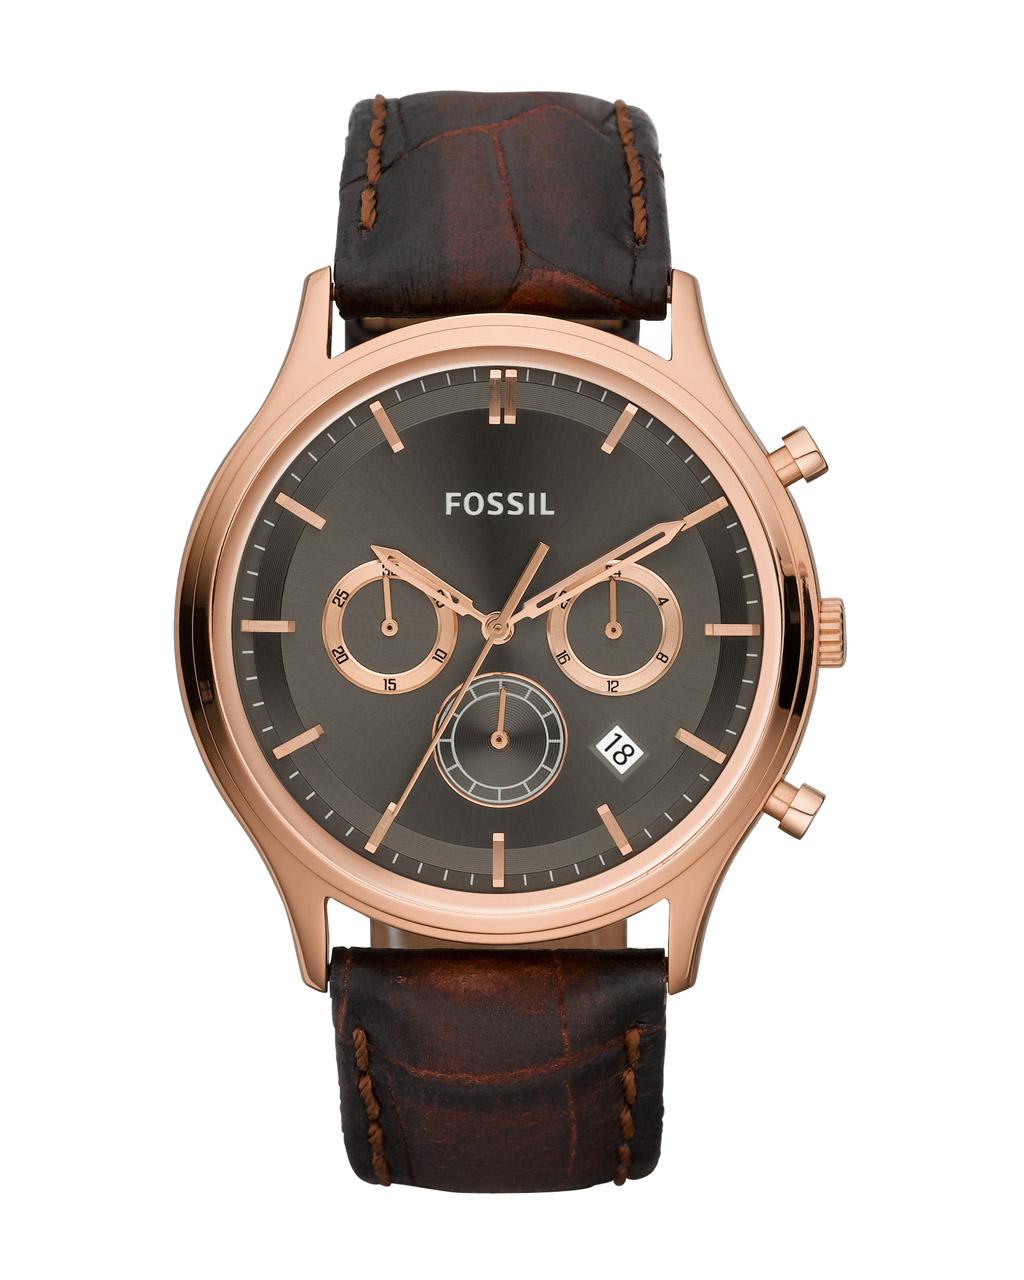 Fossil Ansel Chronograph Brown Leather Strap FS4639   προσφορεσ ρολόγια ρολόγια από 100 έως 300ε